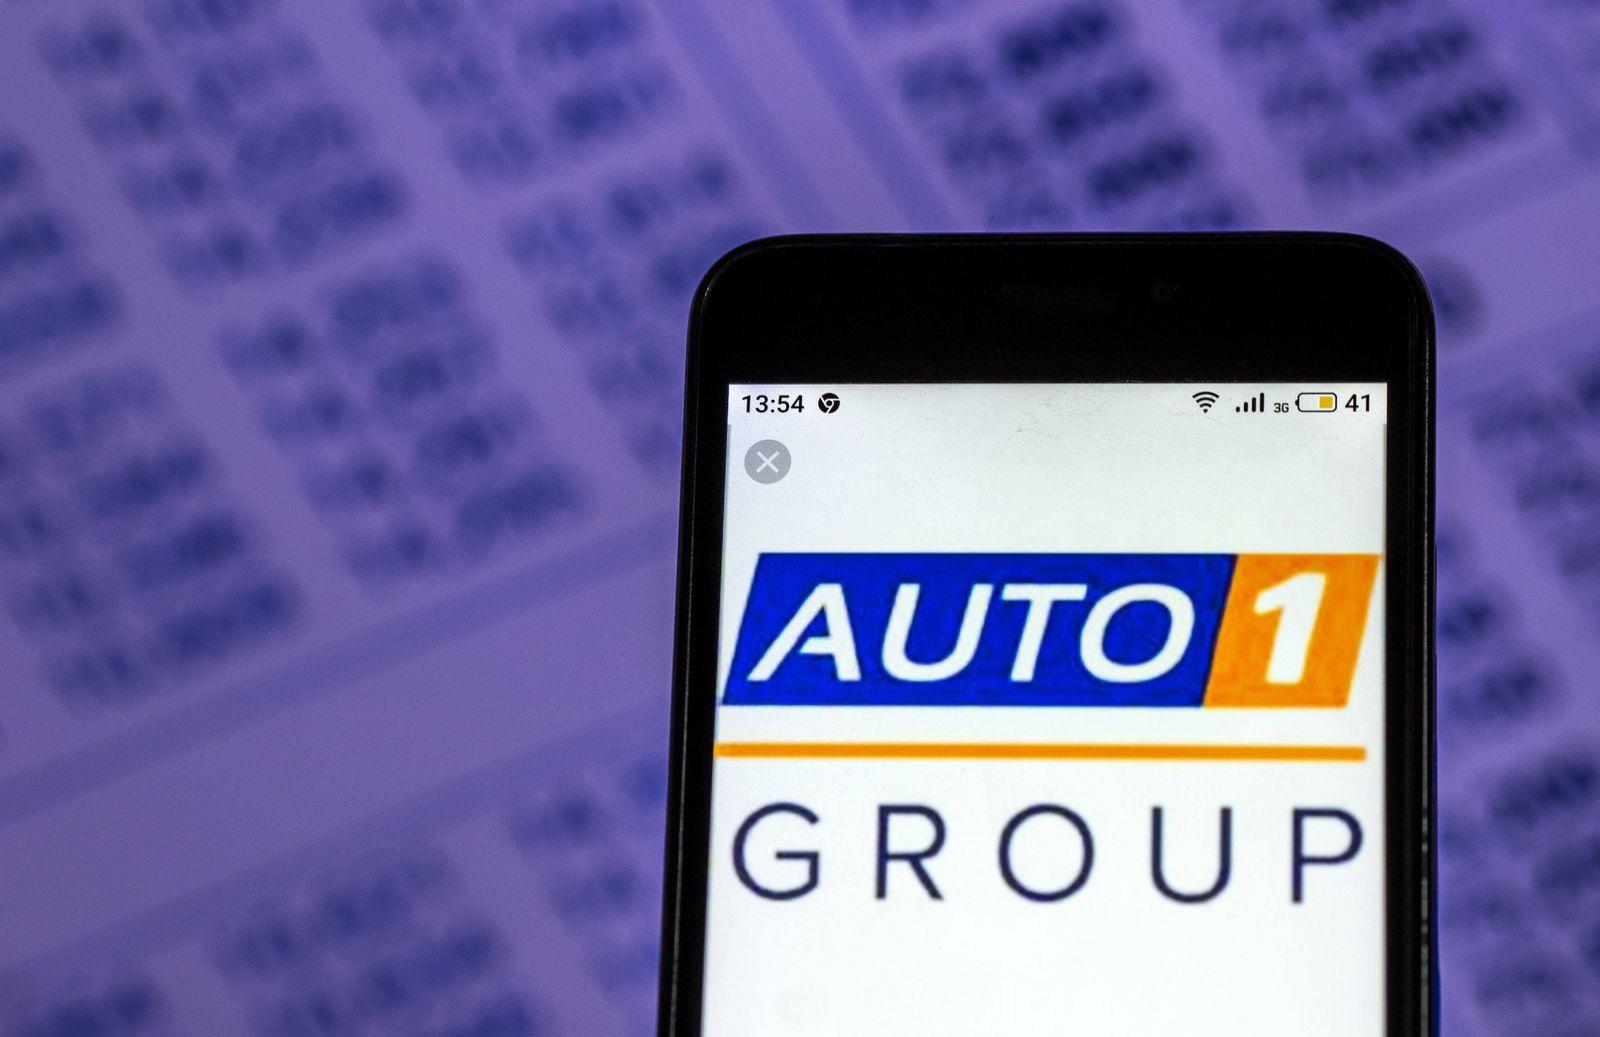 December 7 2018 Kiev Ukraine AUTO1 Group Europe÷s leading car trading platform logo seen displ